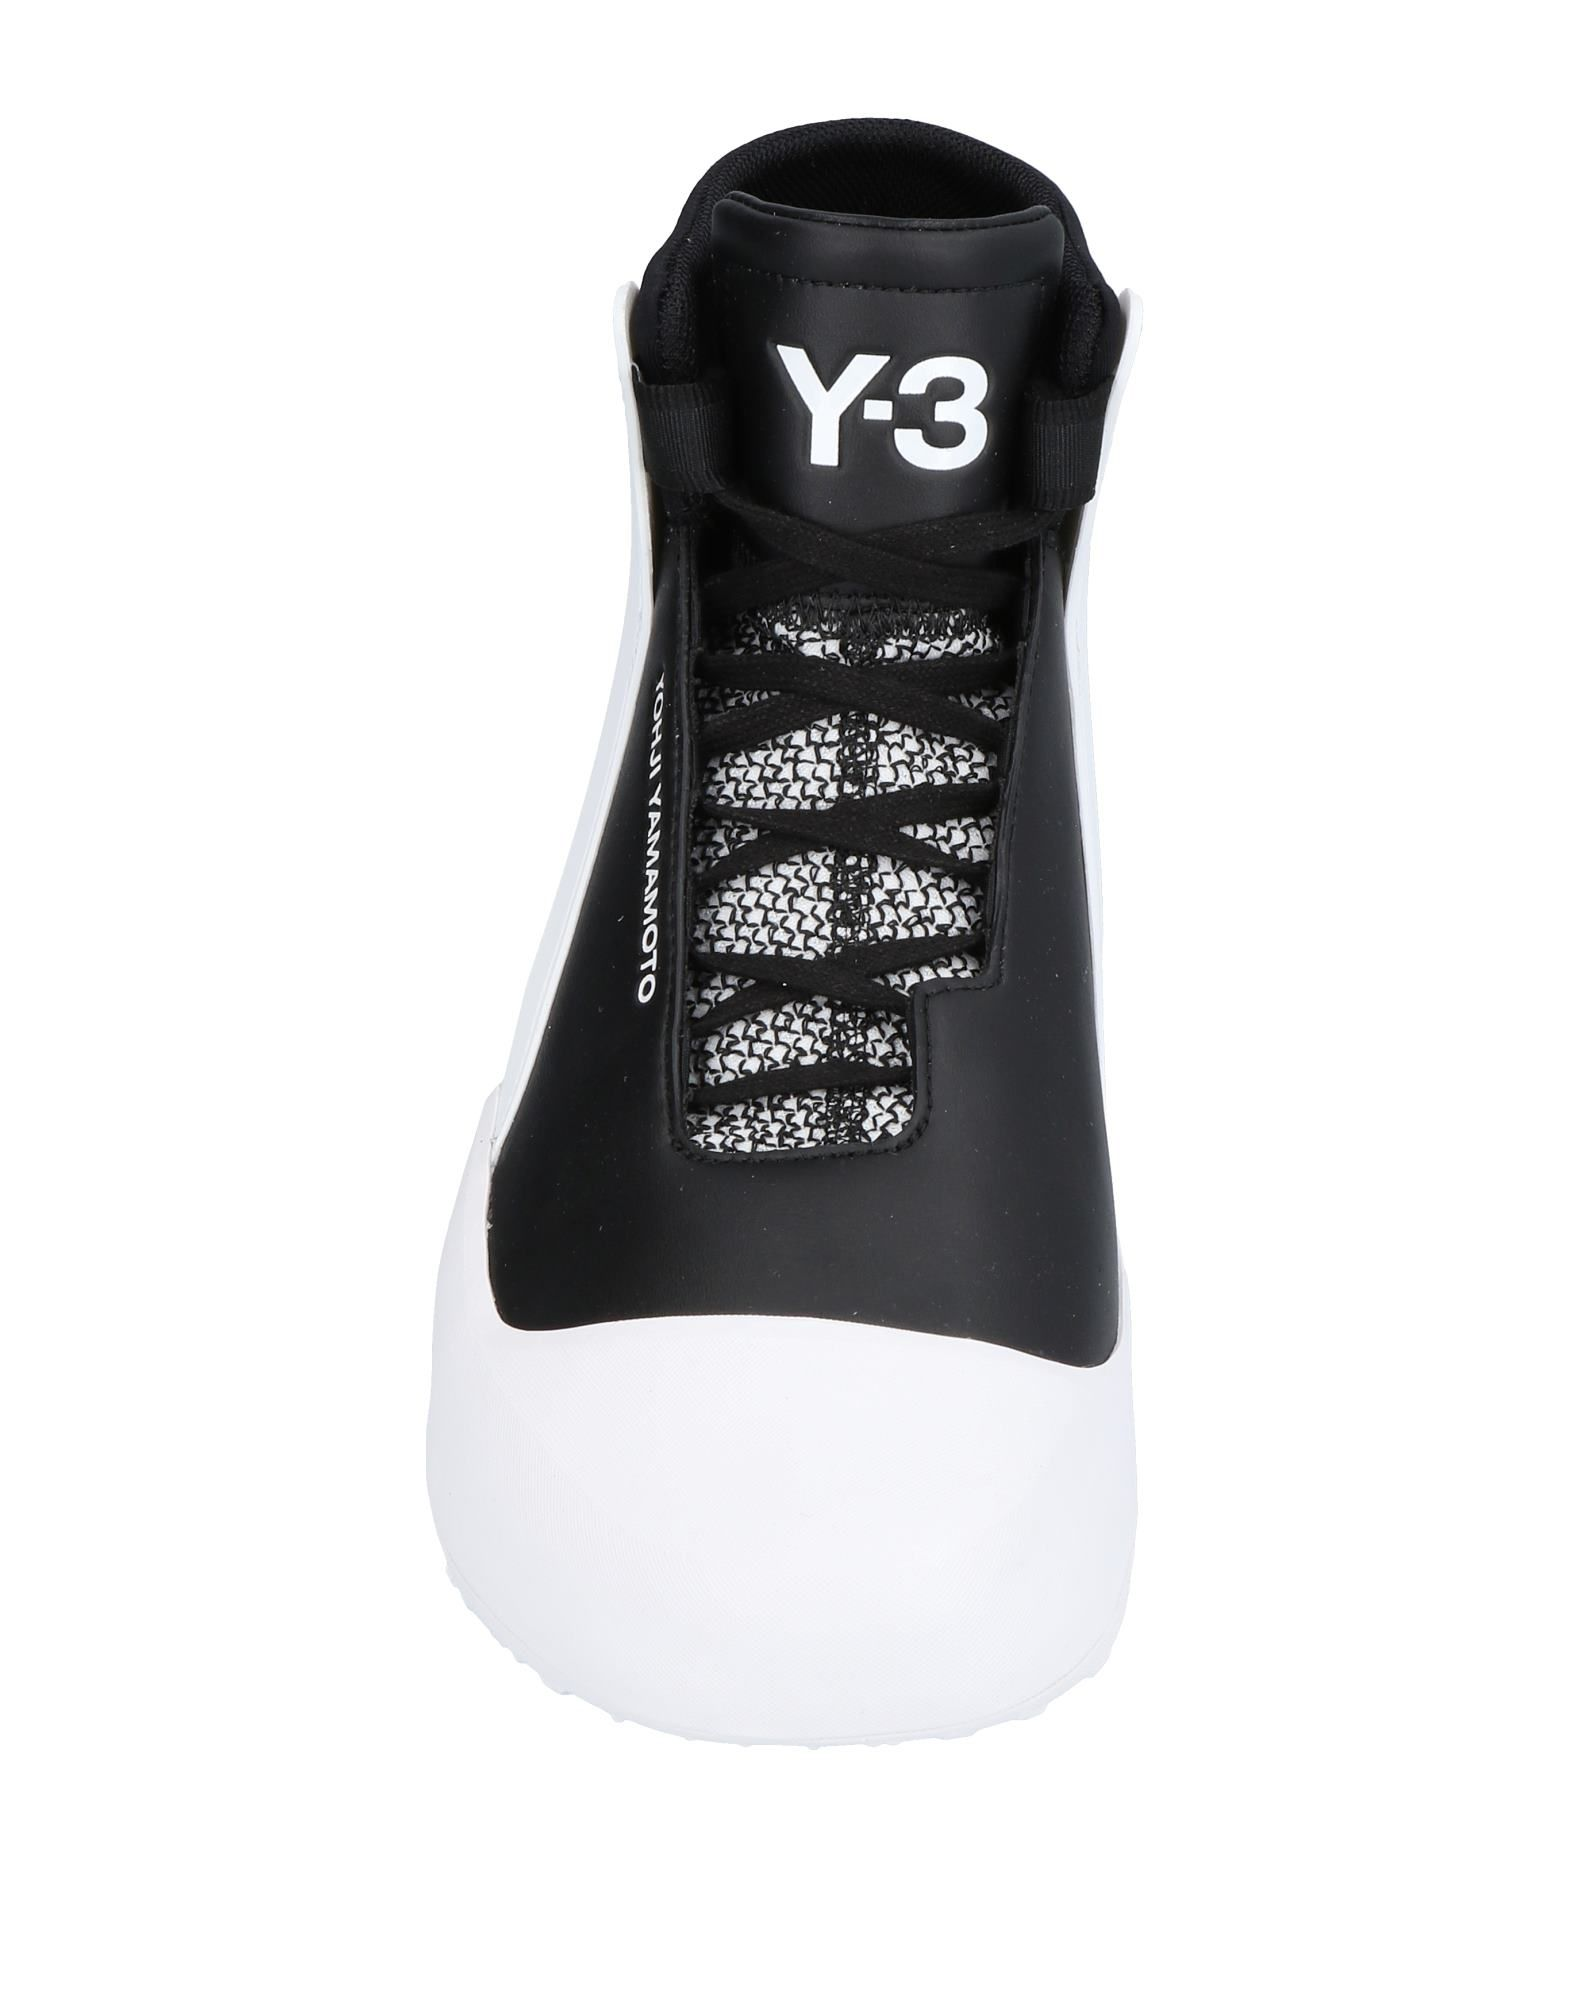 Adidas By Yohji Yamamoto Sneakers Herren beliebte  11463557FS Gute Qualität beliebte Herren Schuhe 901501